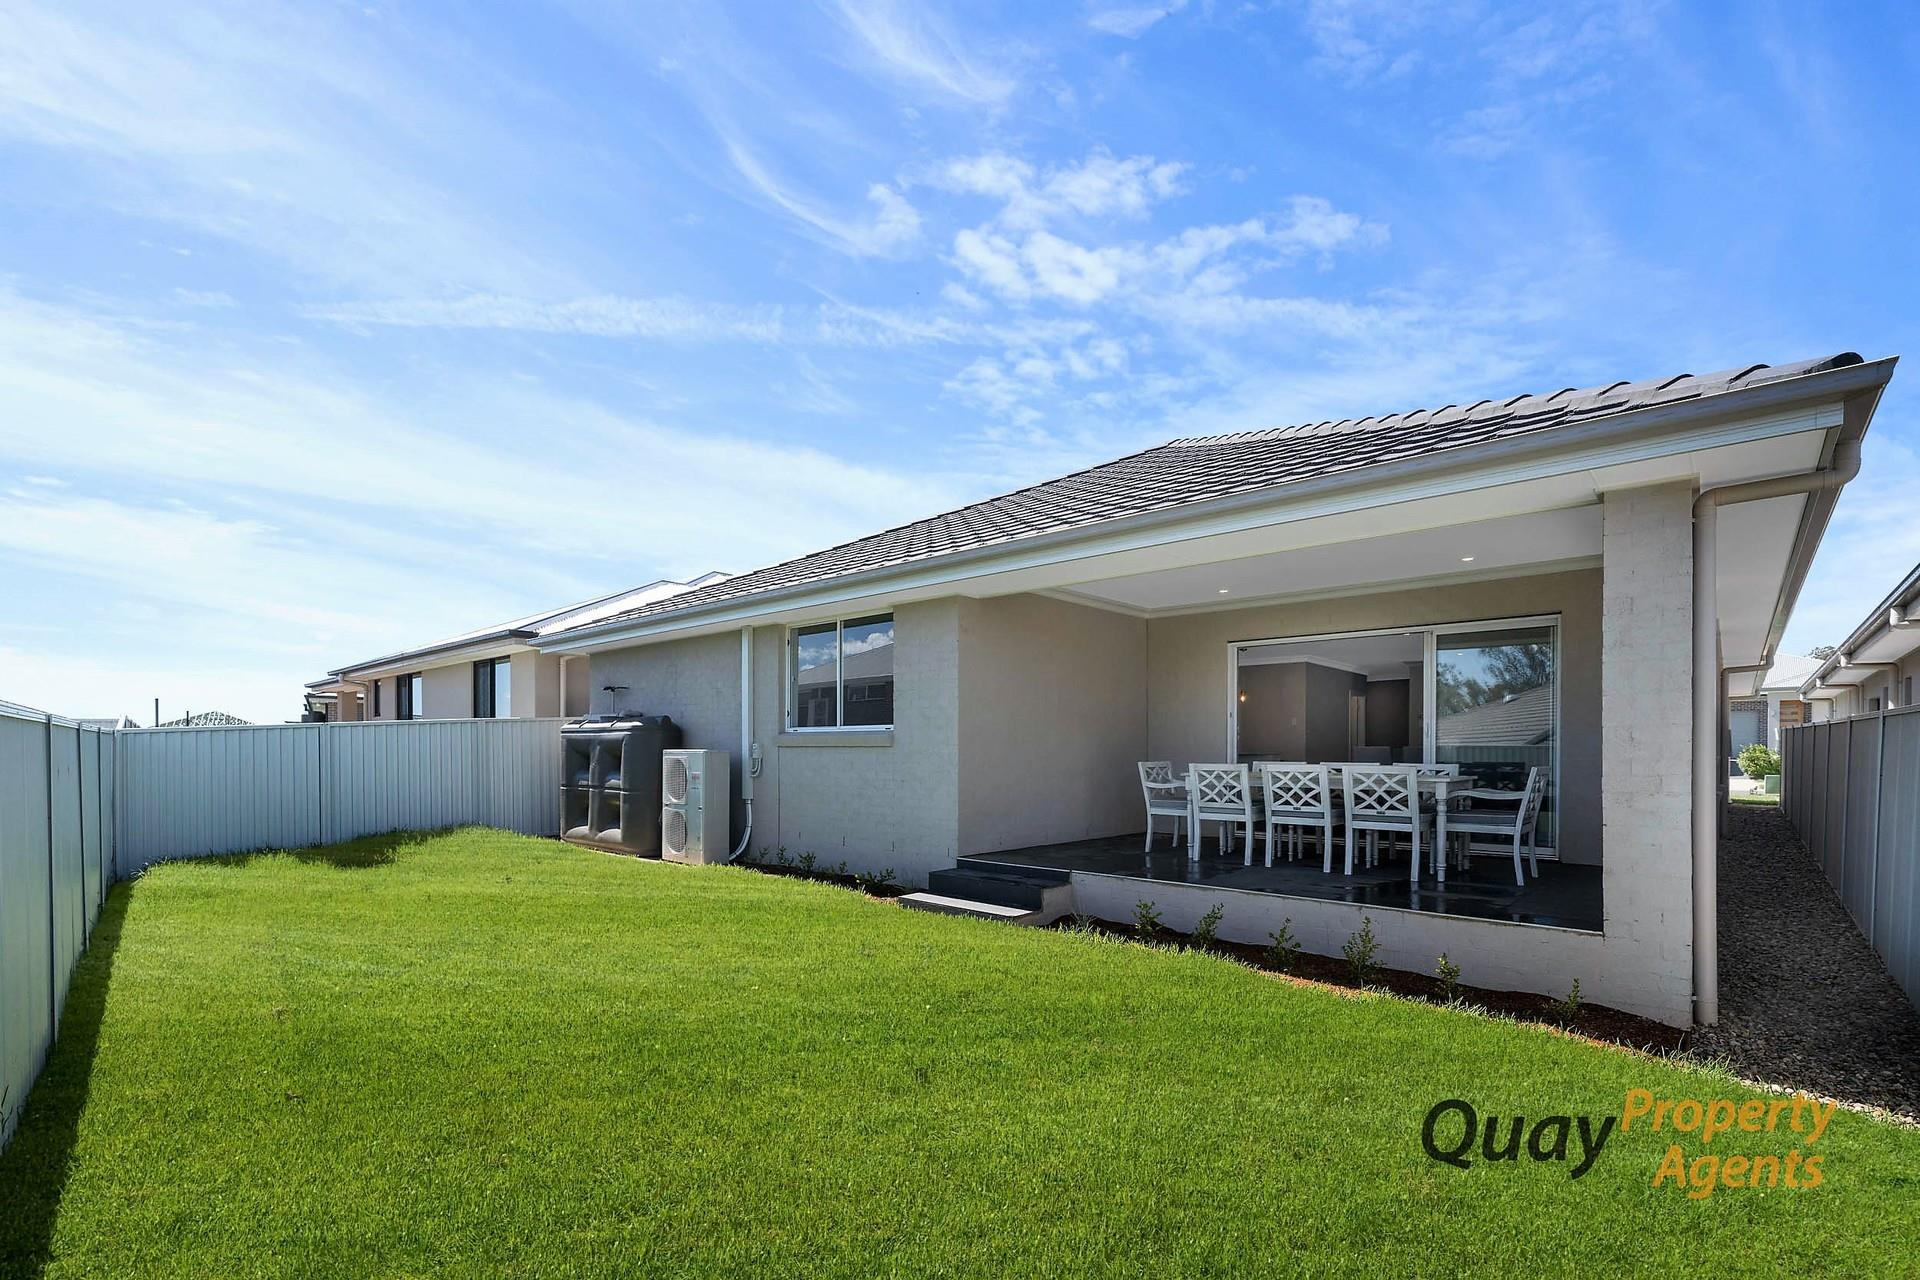 97 Skaife St, Oran Park, NSW 2570